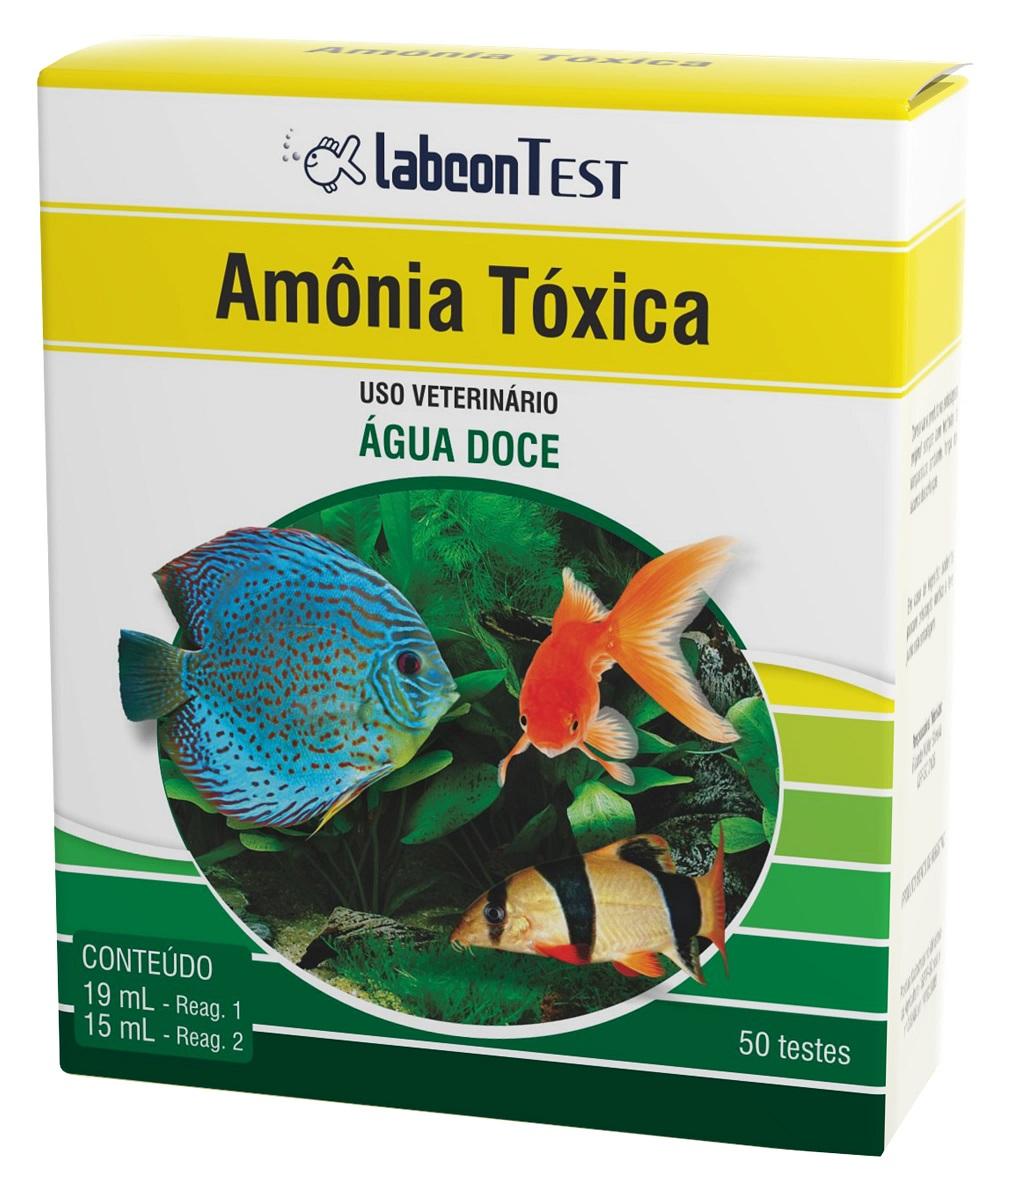 Labcon Teste de  Amonia Toxica Agua Doce - 50 Testes